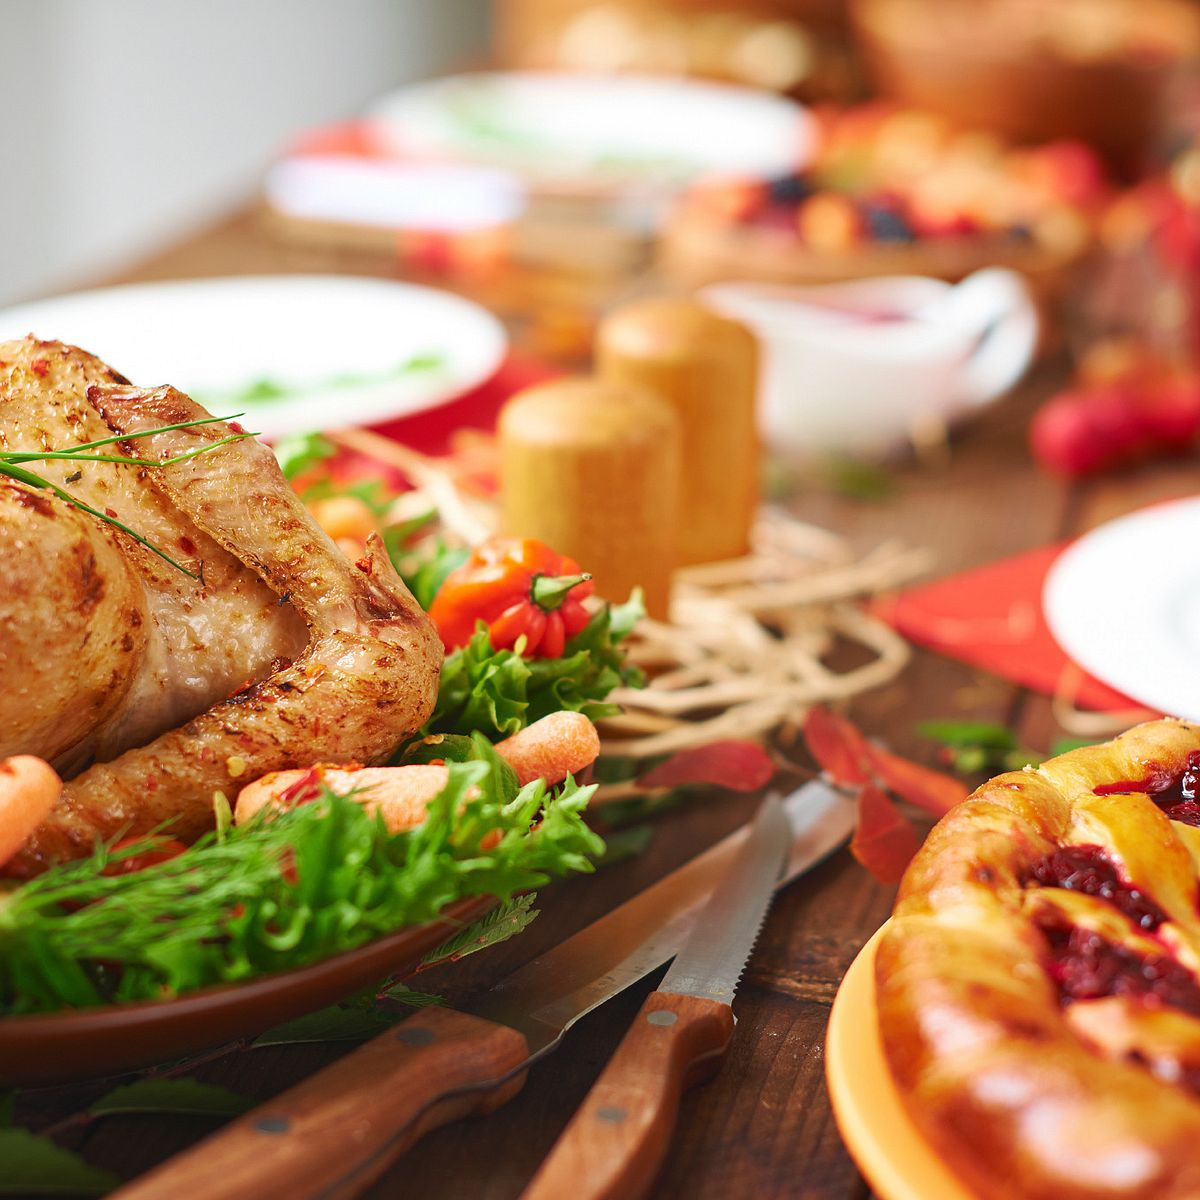 7 Ways To Avoid Overdoing It This Holiday Season